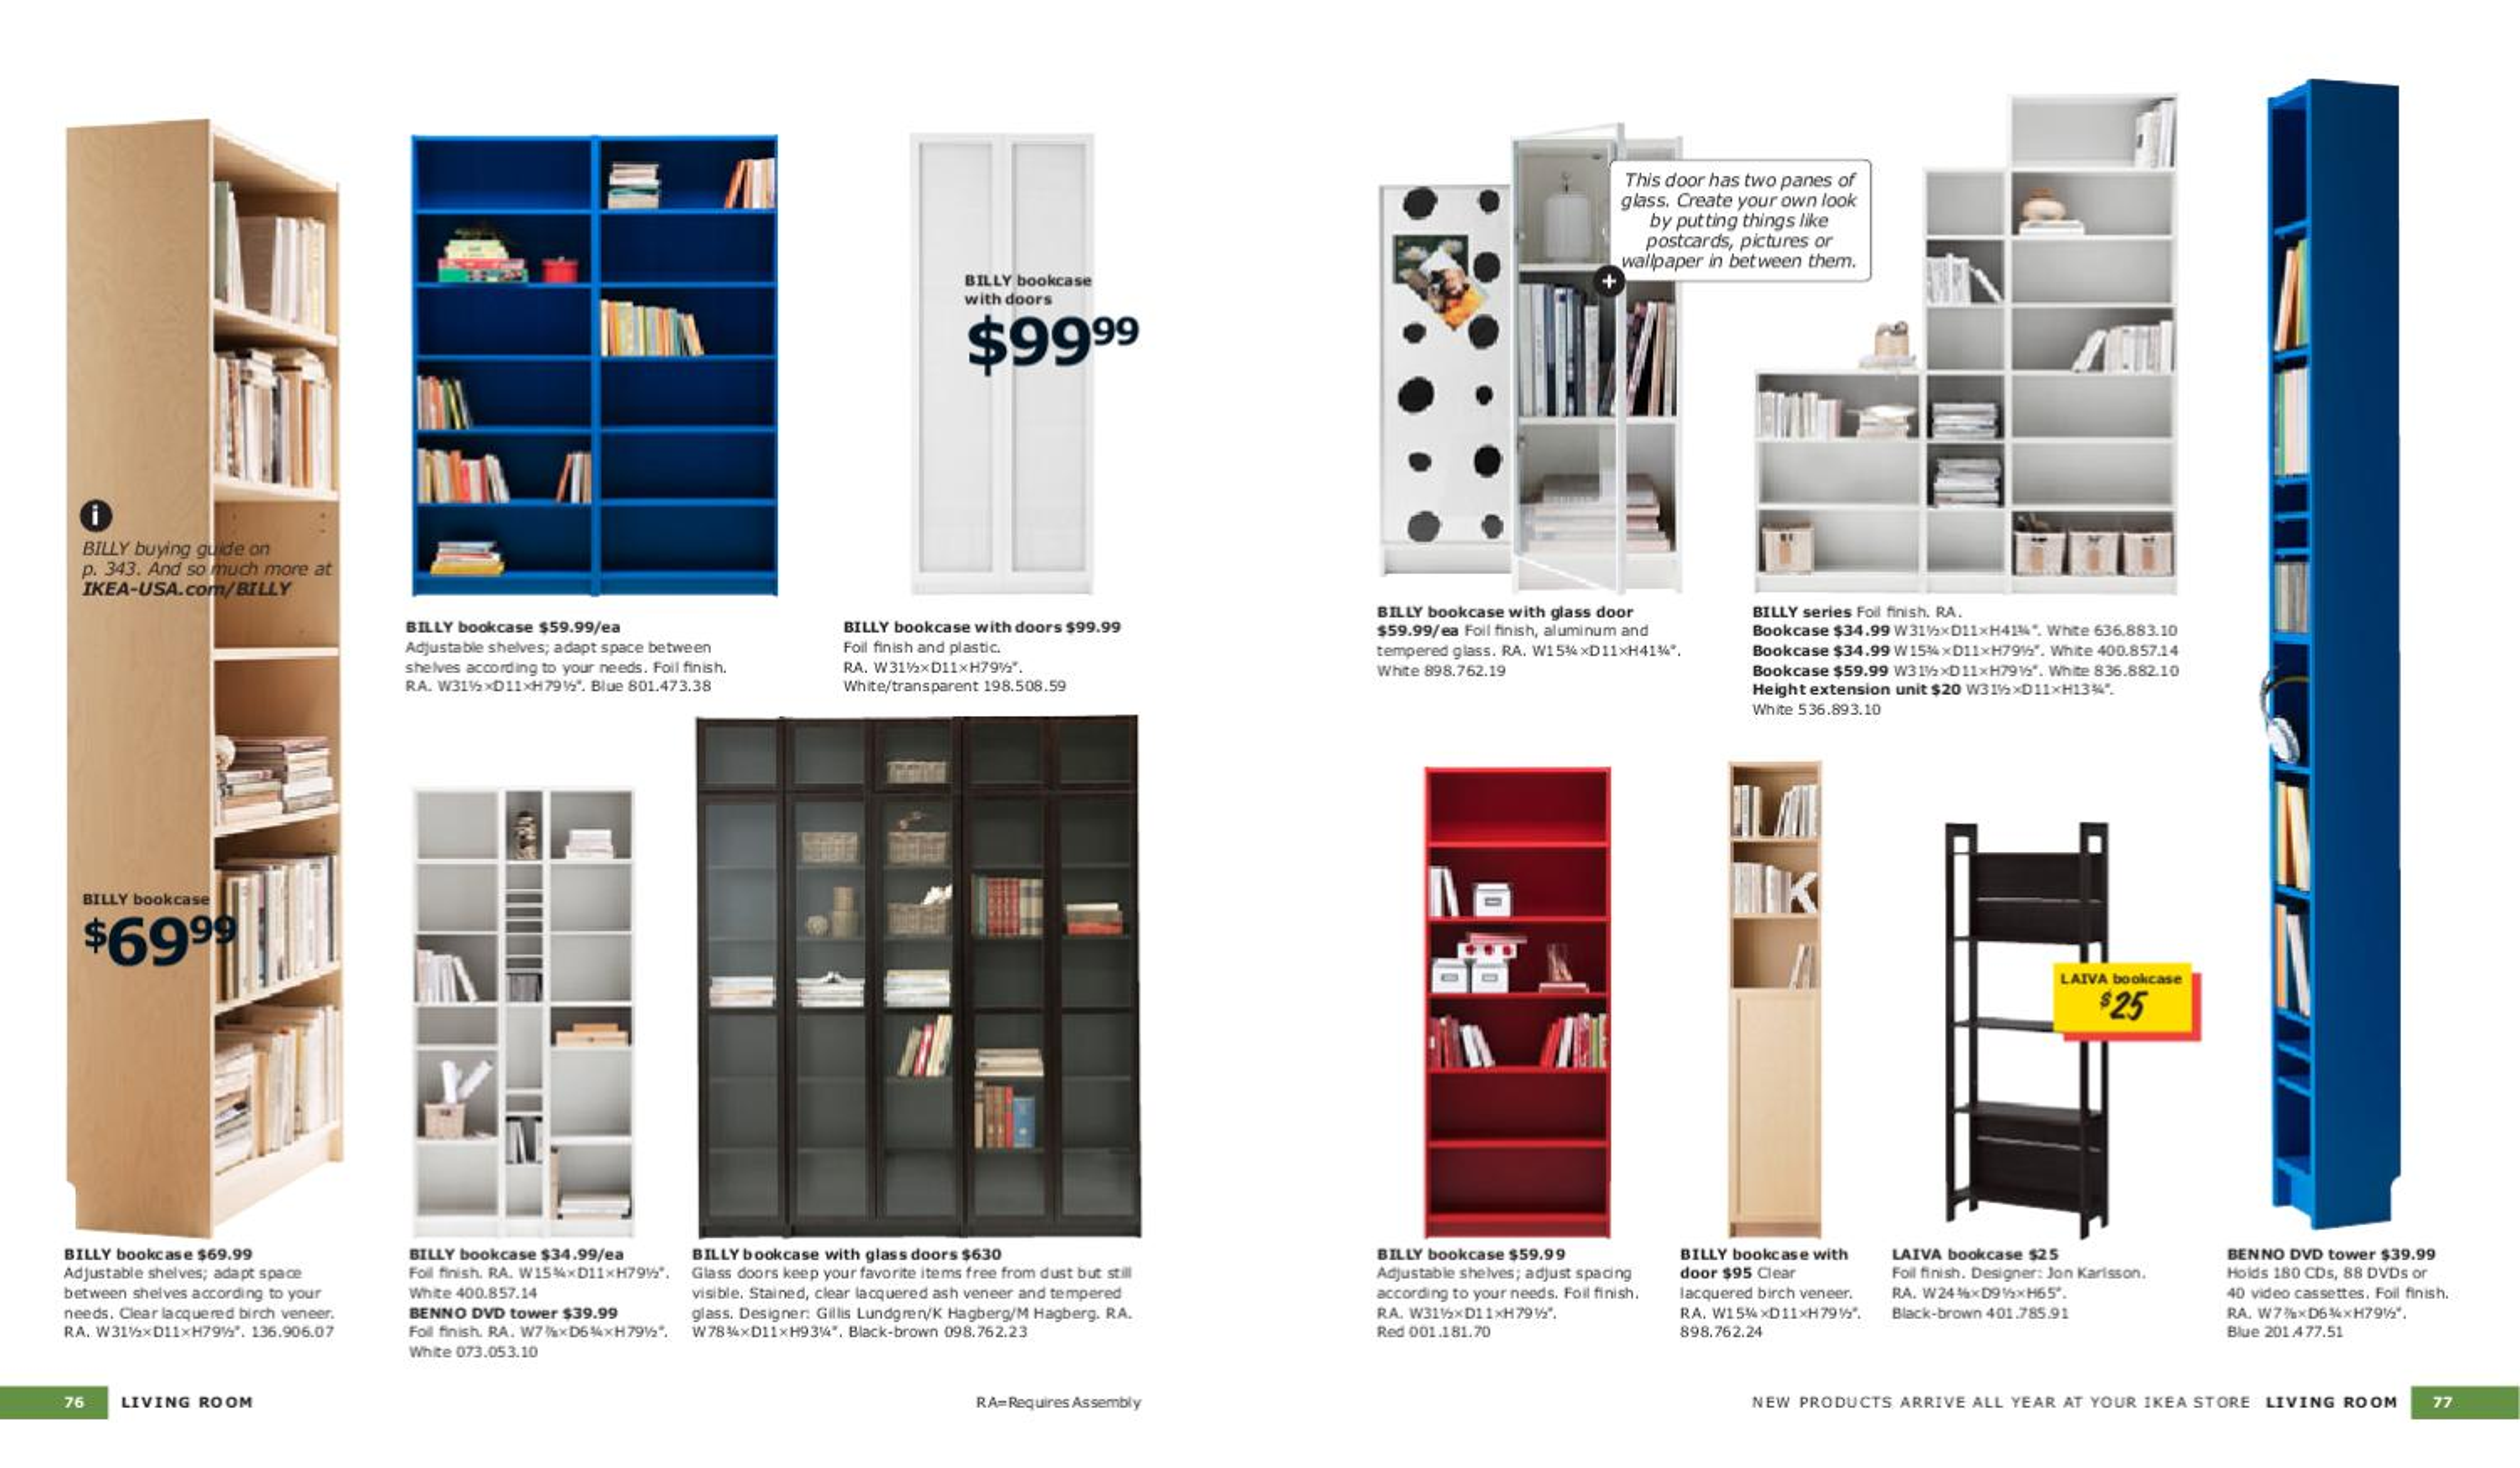 Ikea Catalog 2011 By Britney Bane Issuu